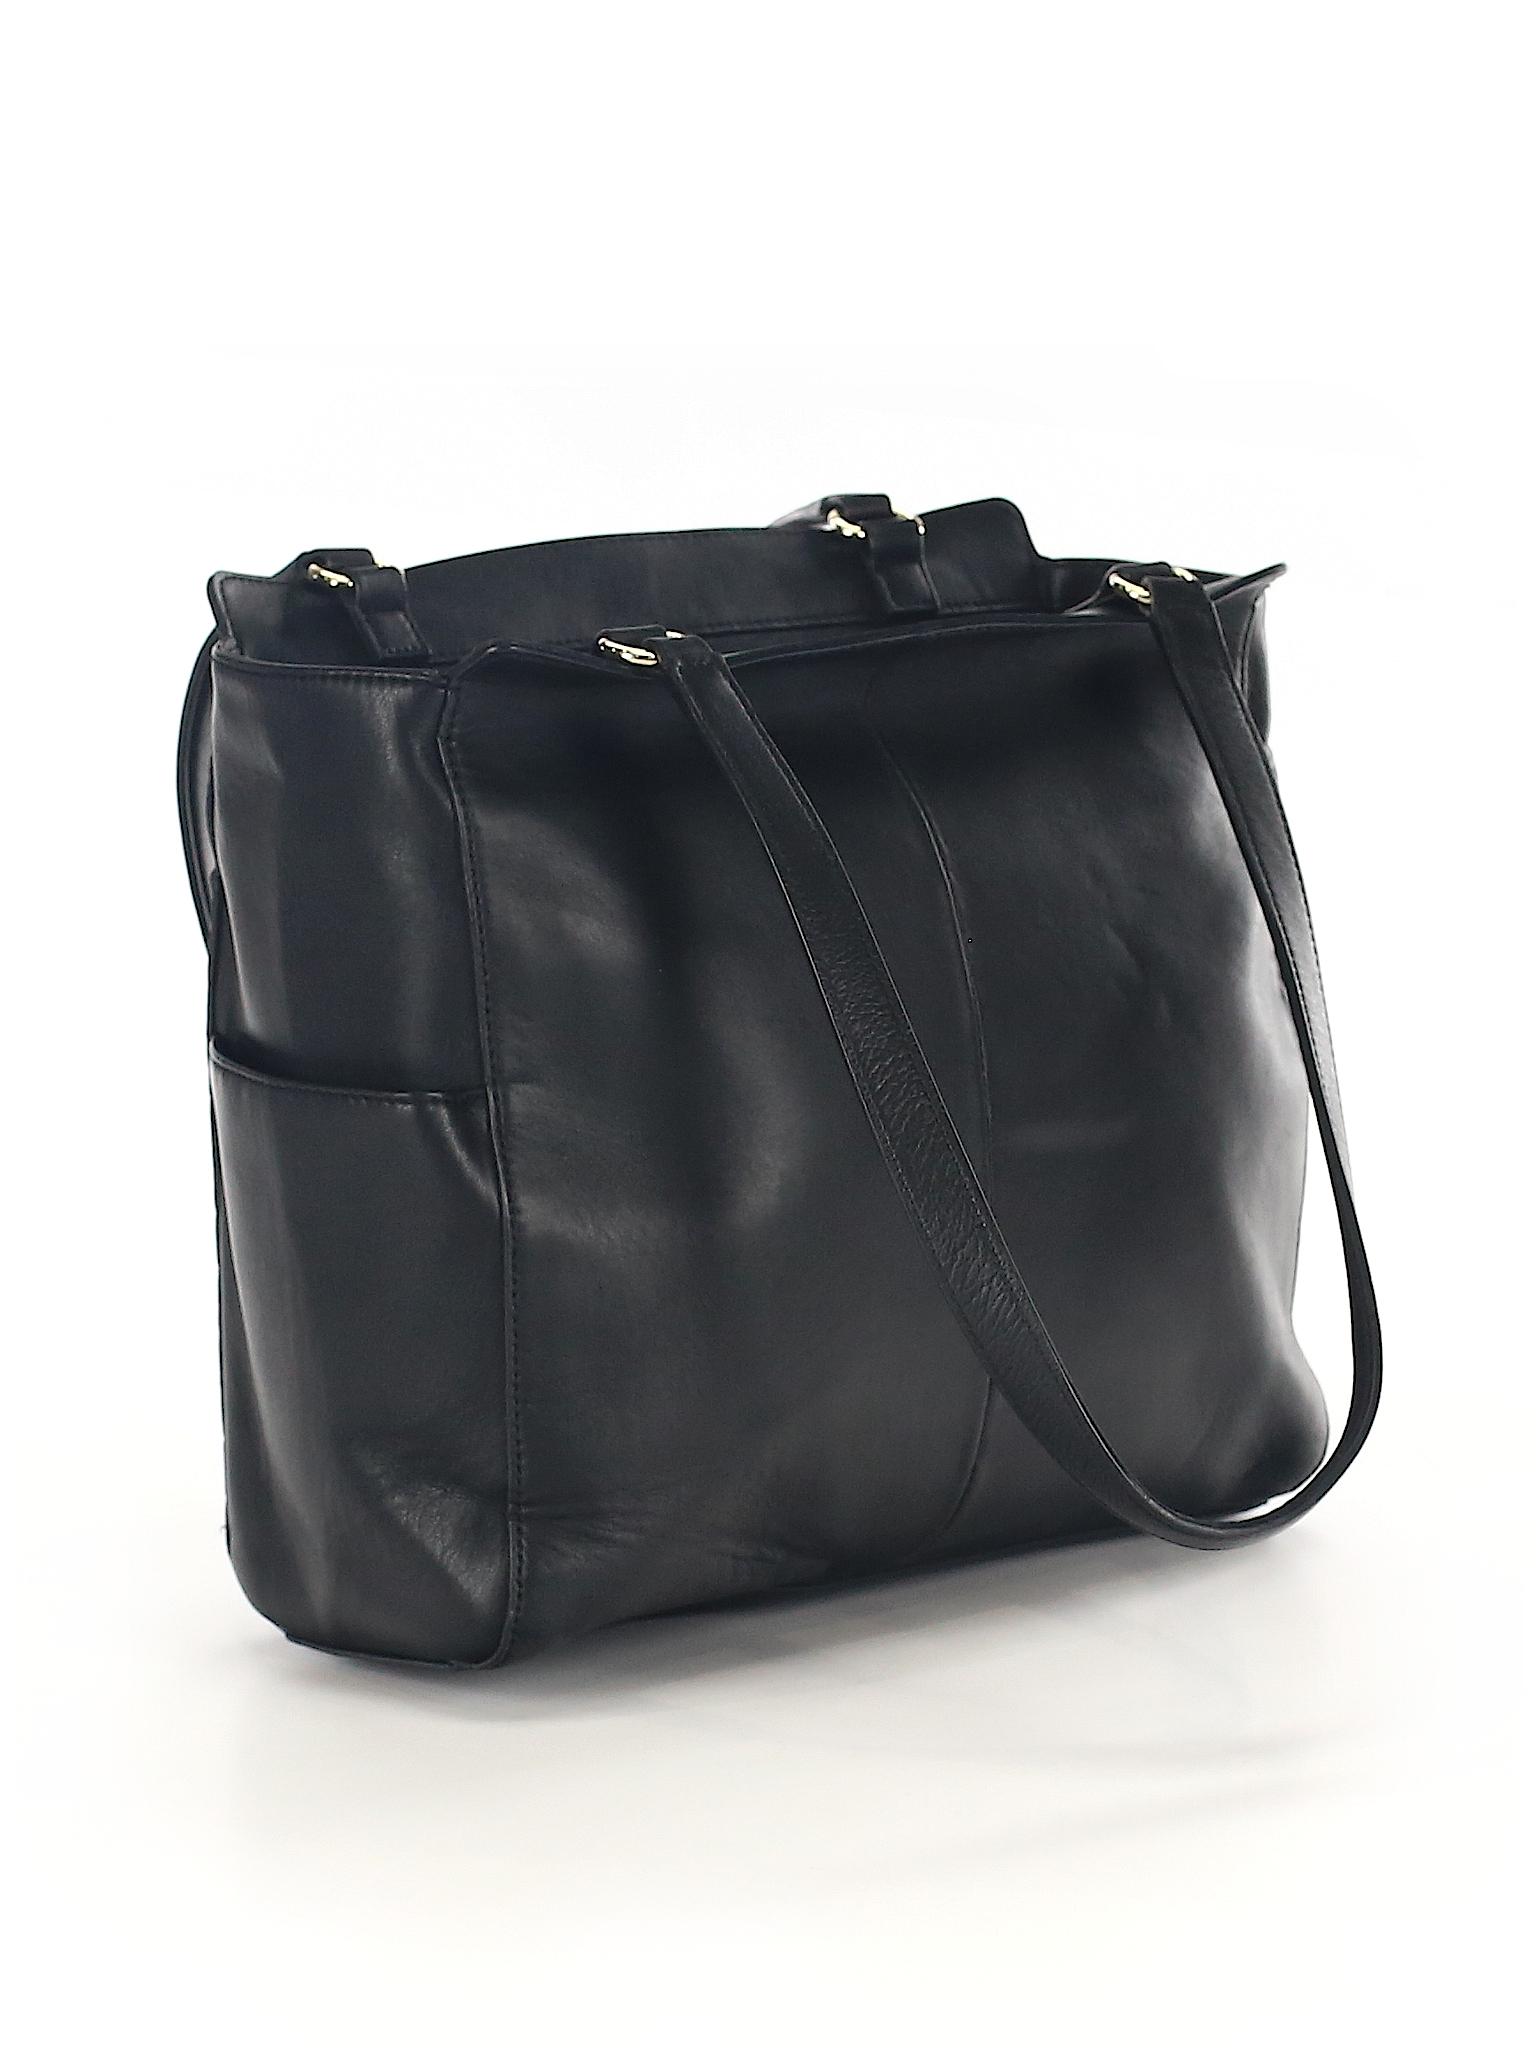 1e2f2eaefba3d0 Karl Lagerfeld Paris 100% Leather Chevron Herringbone Black Leather ...